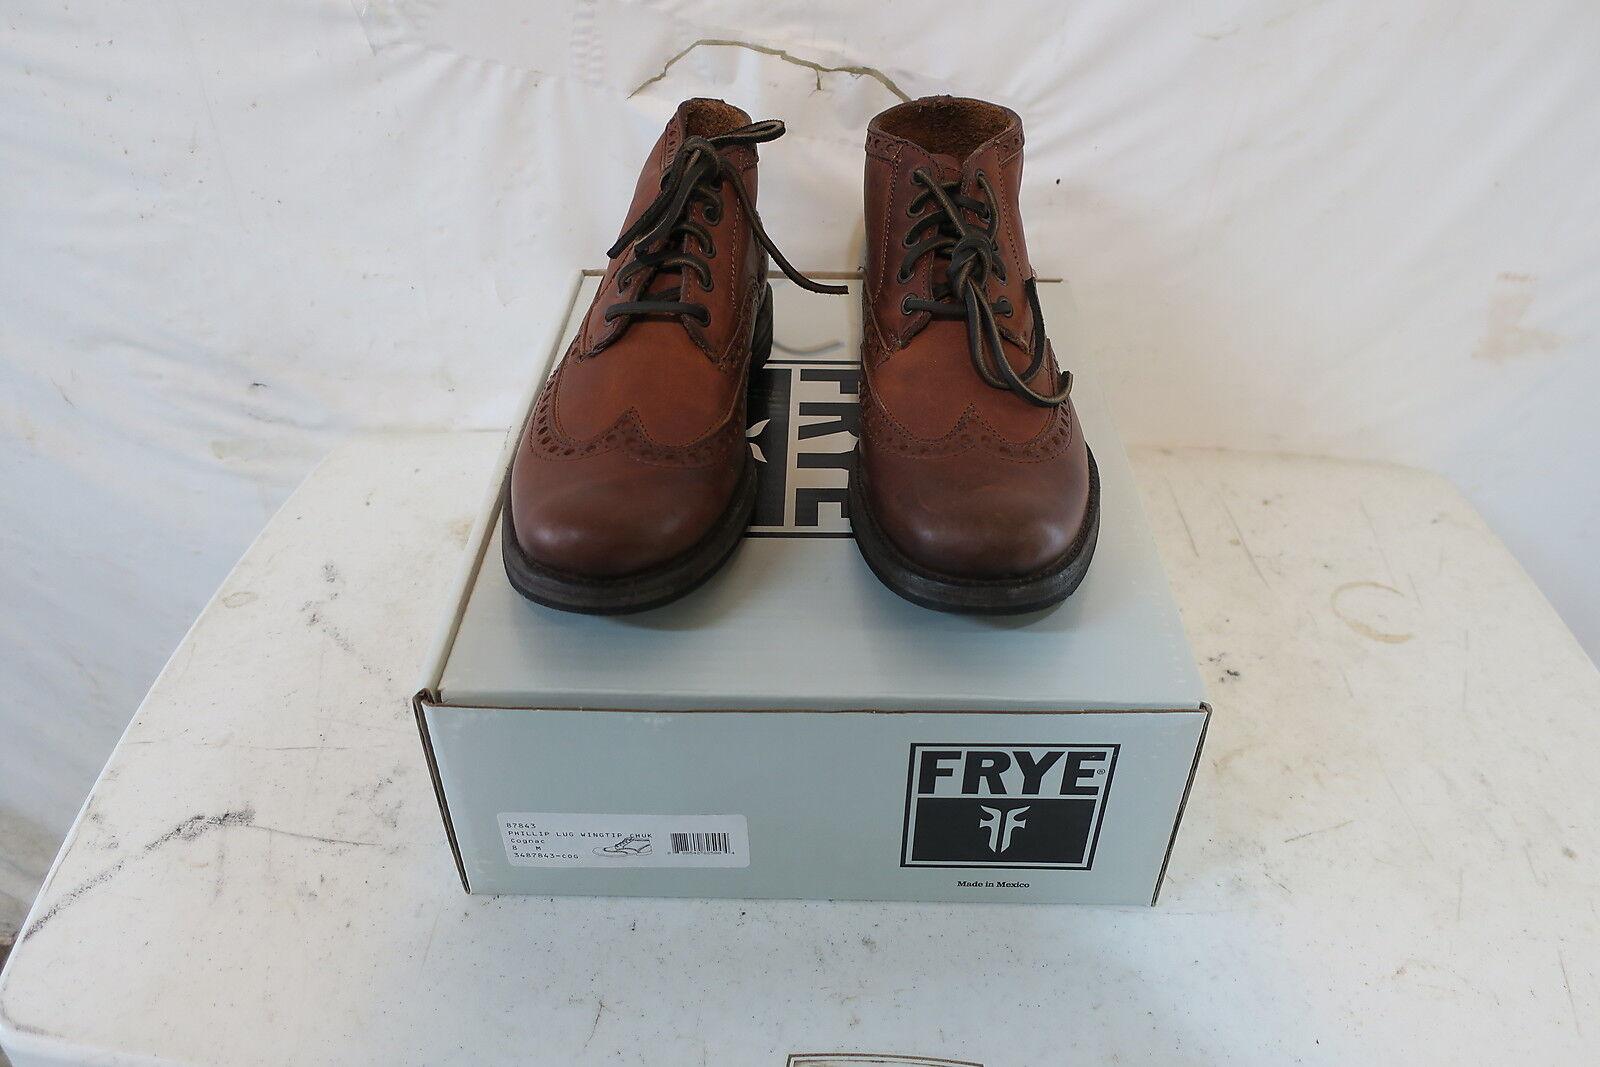 Frye Phillip Lug Wingtip Chukka Men's 8.0 Cognac Retail $398